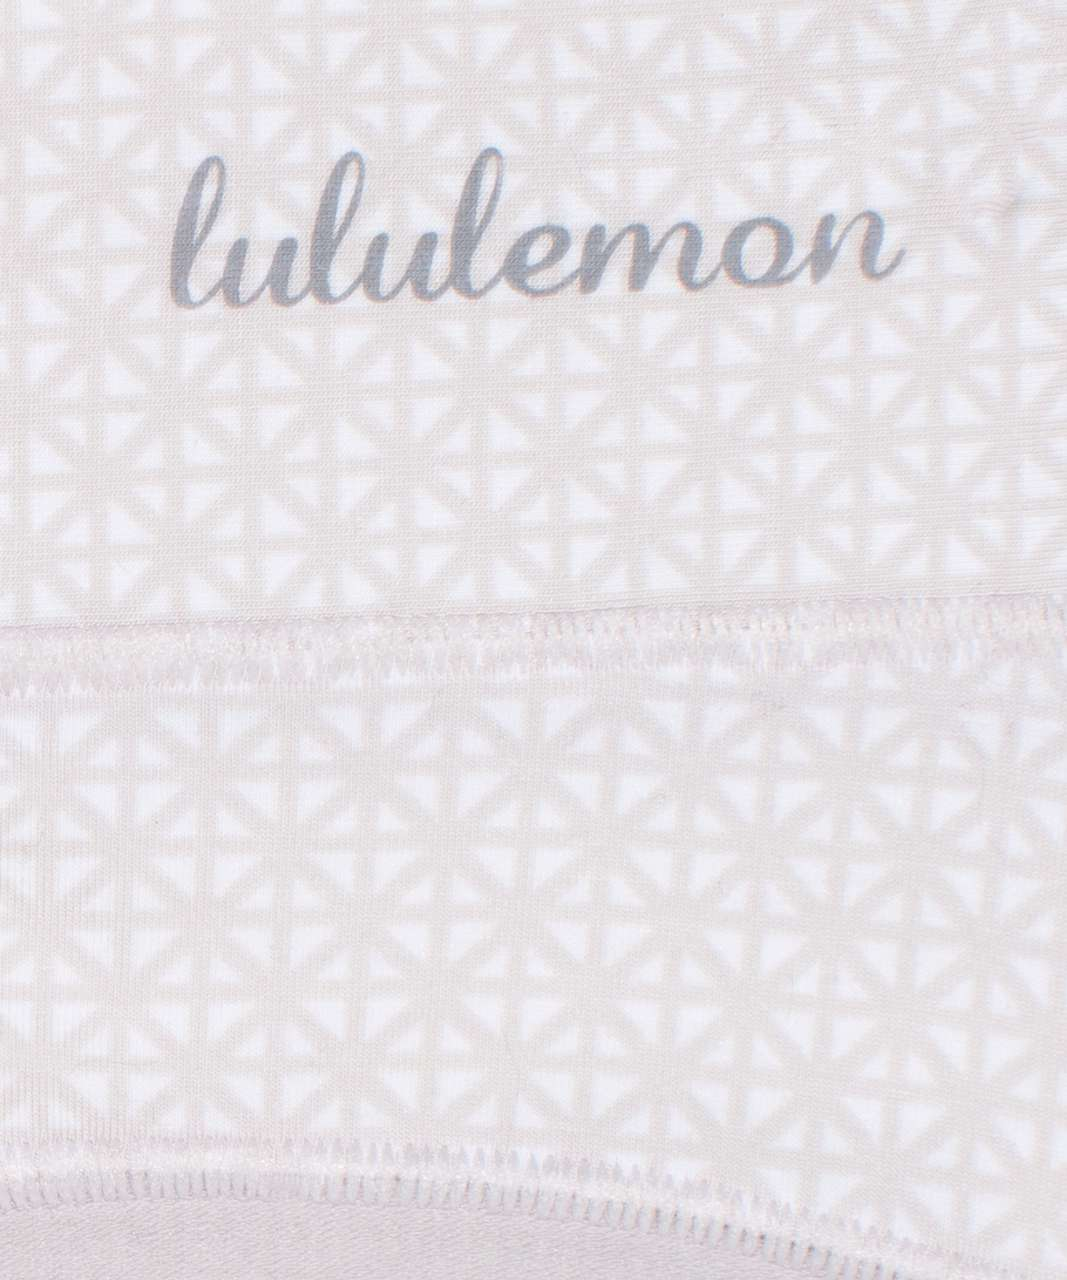 Lululemon Soft Breathable Bikini *3 Pack - Black / Misty Shell / Lattice Work Mini White Chrome